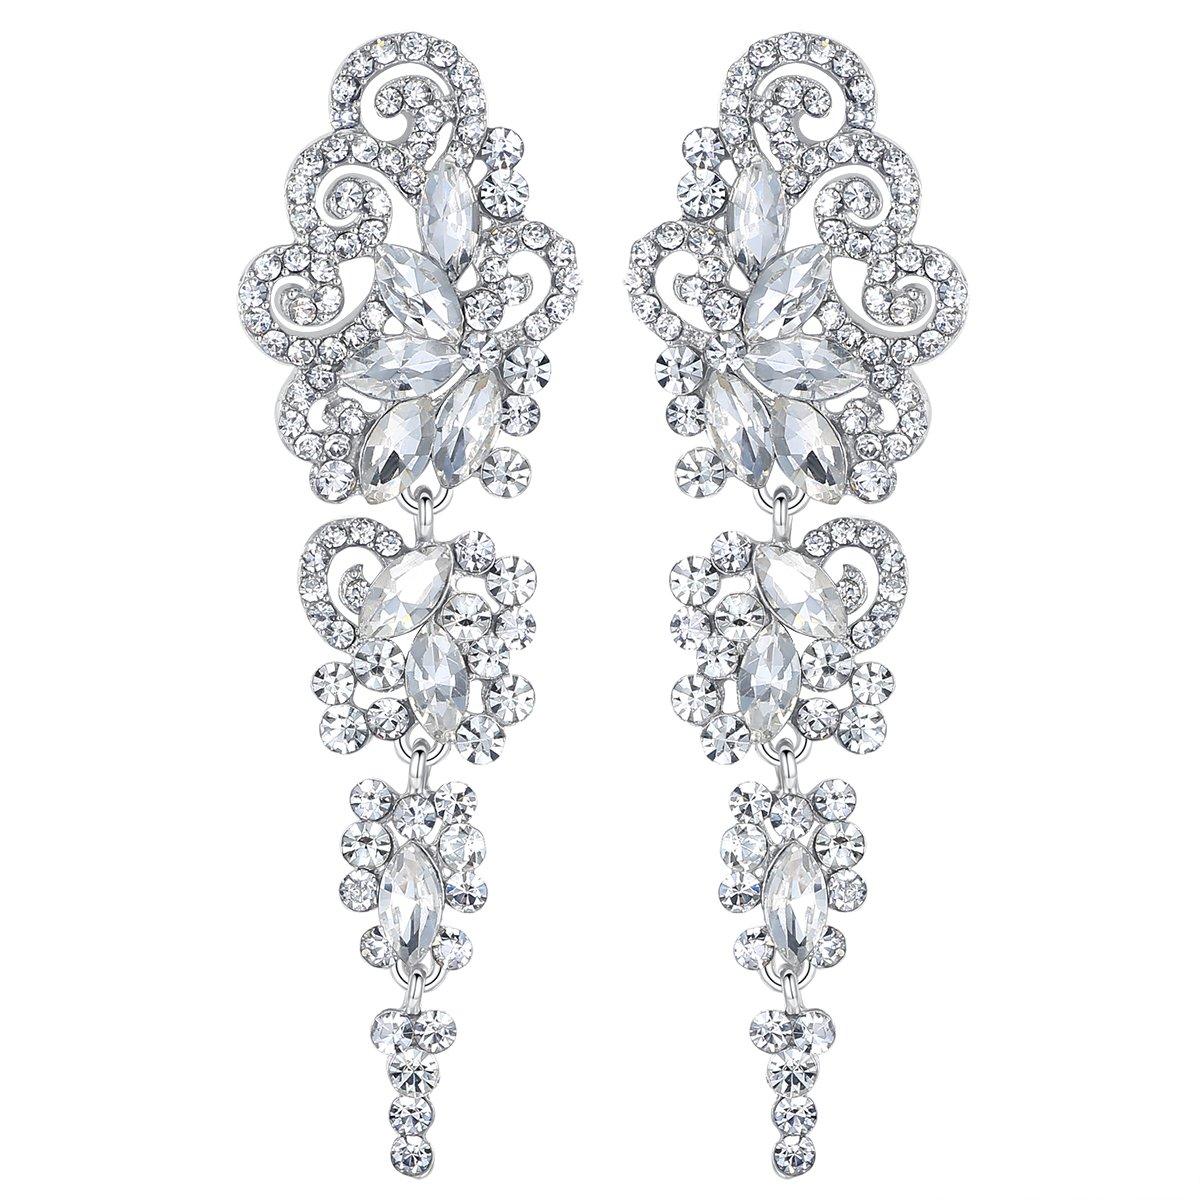 mecresh Drop Crystal Earrings for Women or Wedding, Women's GIFT for Girl or Bride